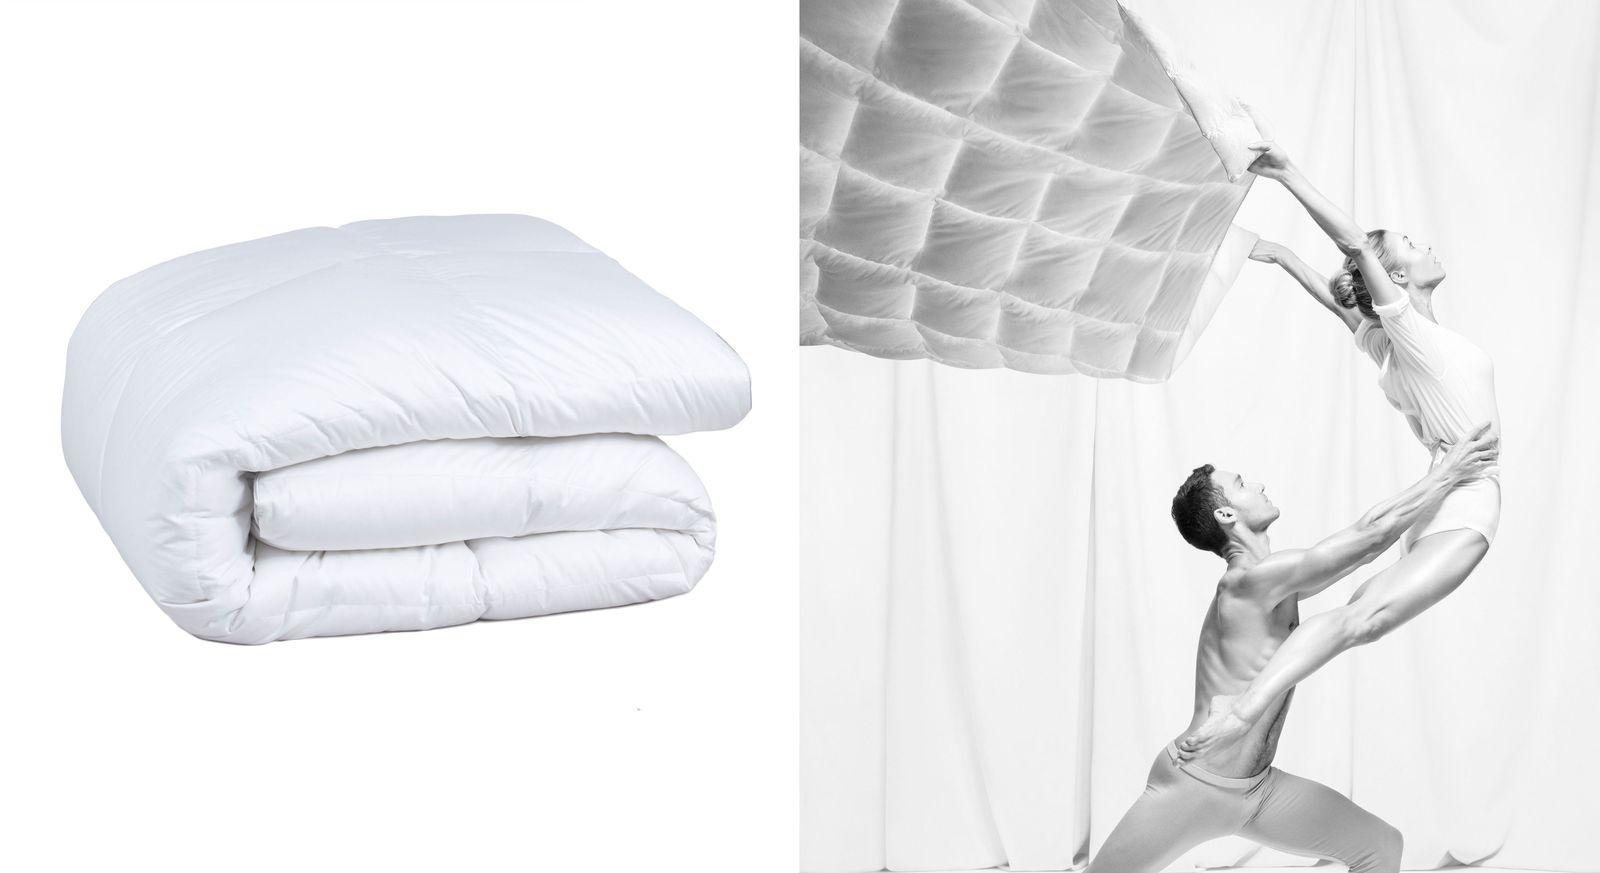 bettdecken baur einrichtungsideen ikea schlafzimmer kallax frottee bettw sche 135x200. Black Bedroom Furniture Sets. Home Design Ideas